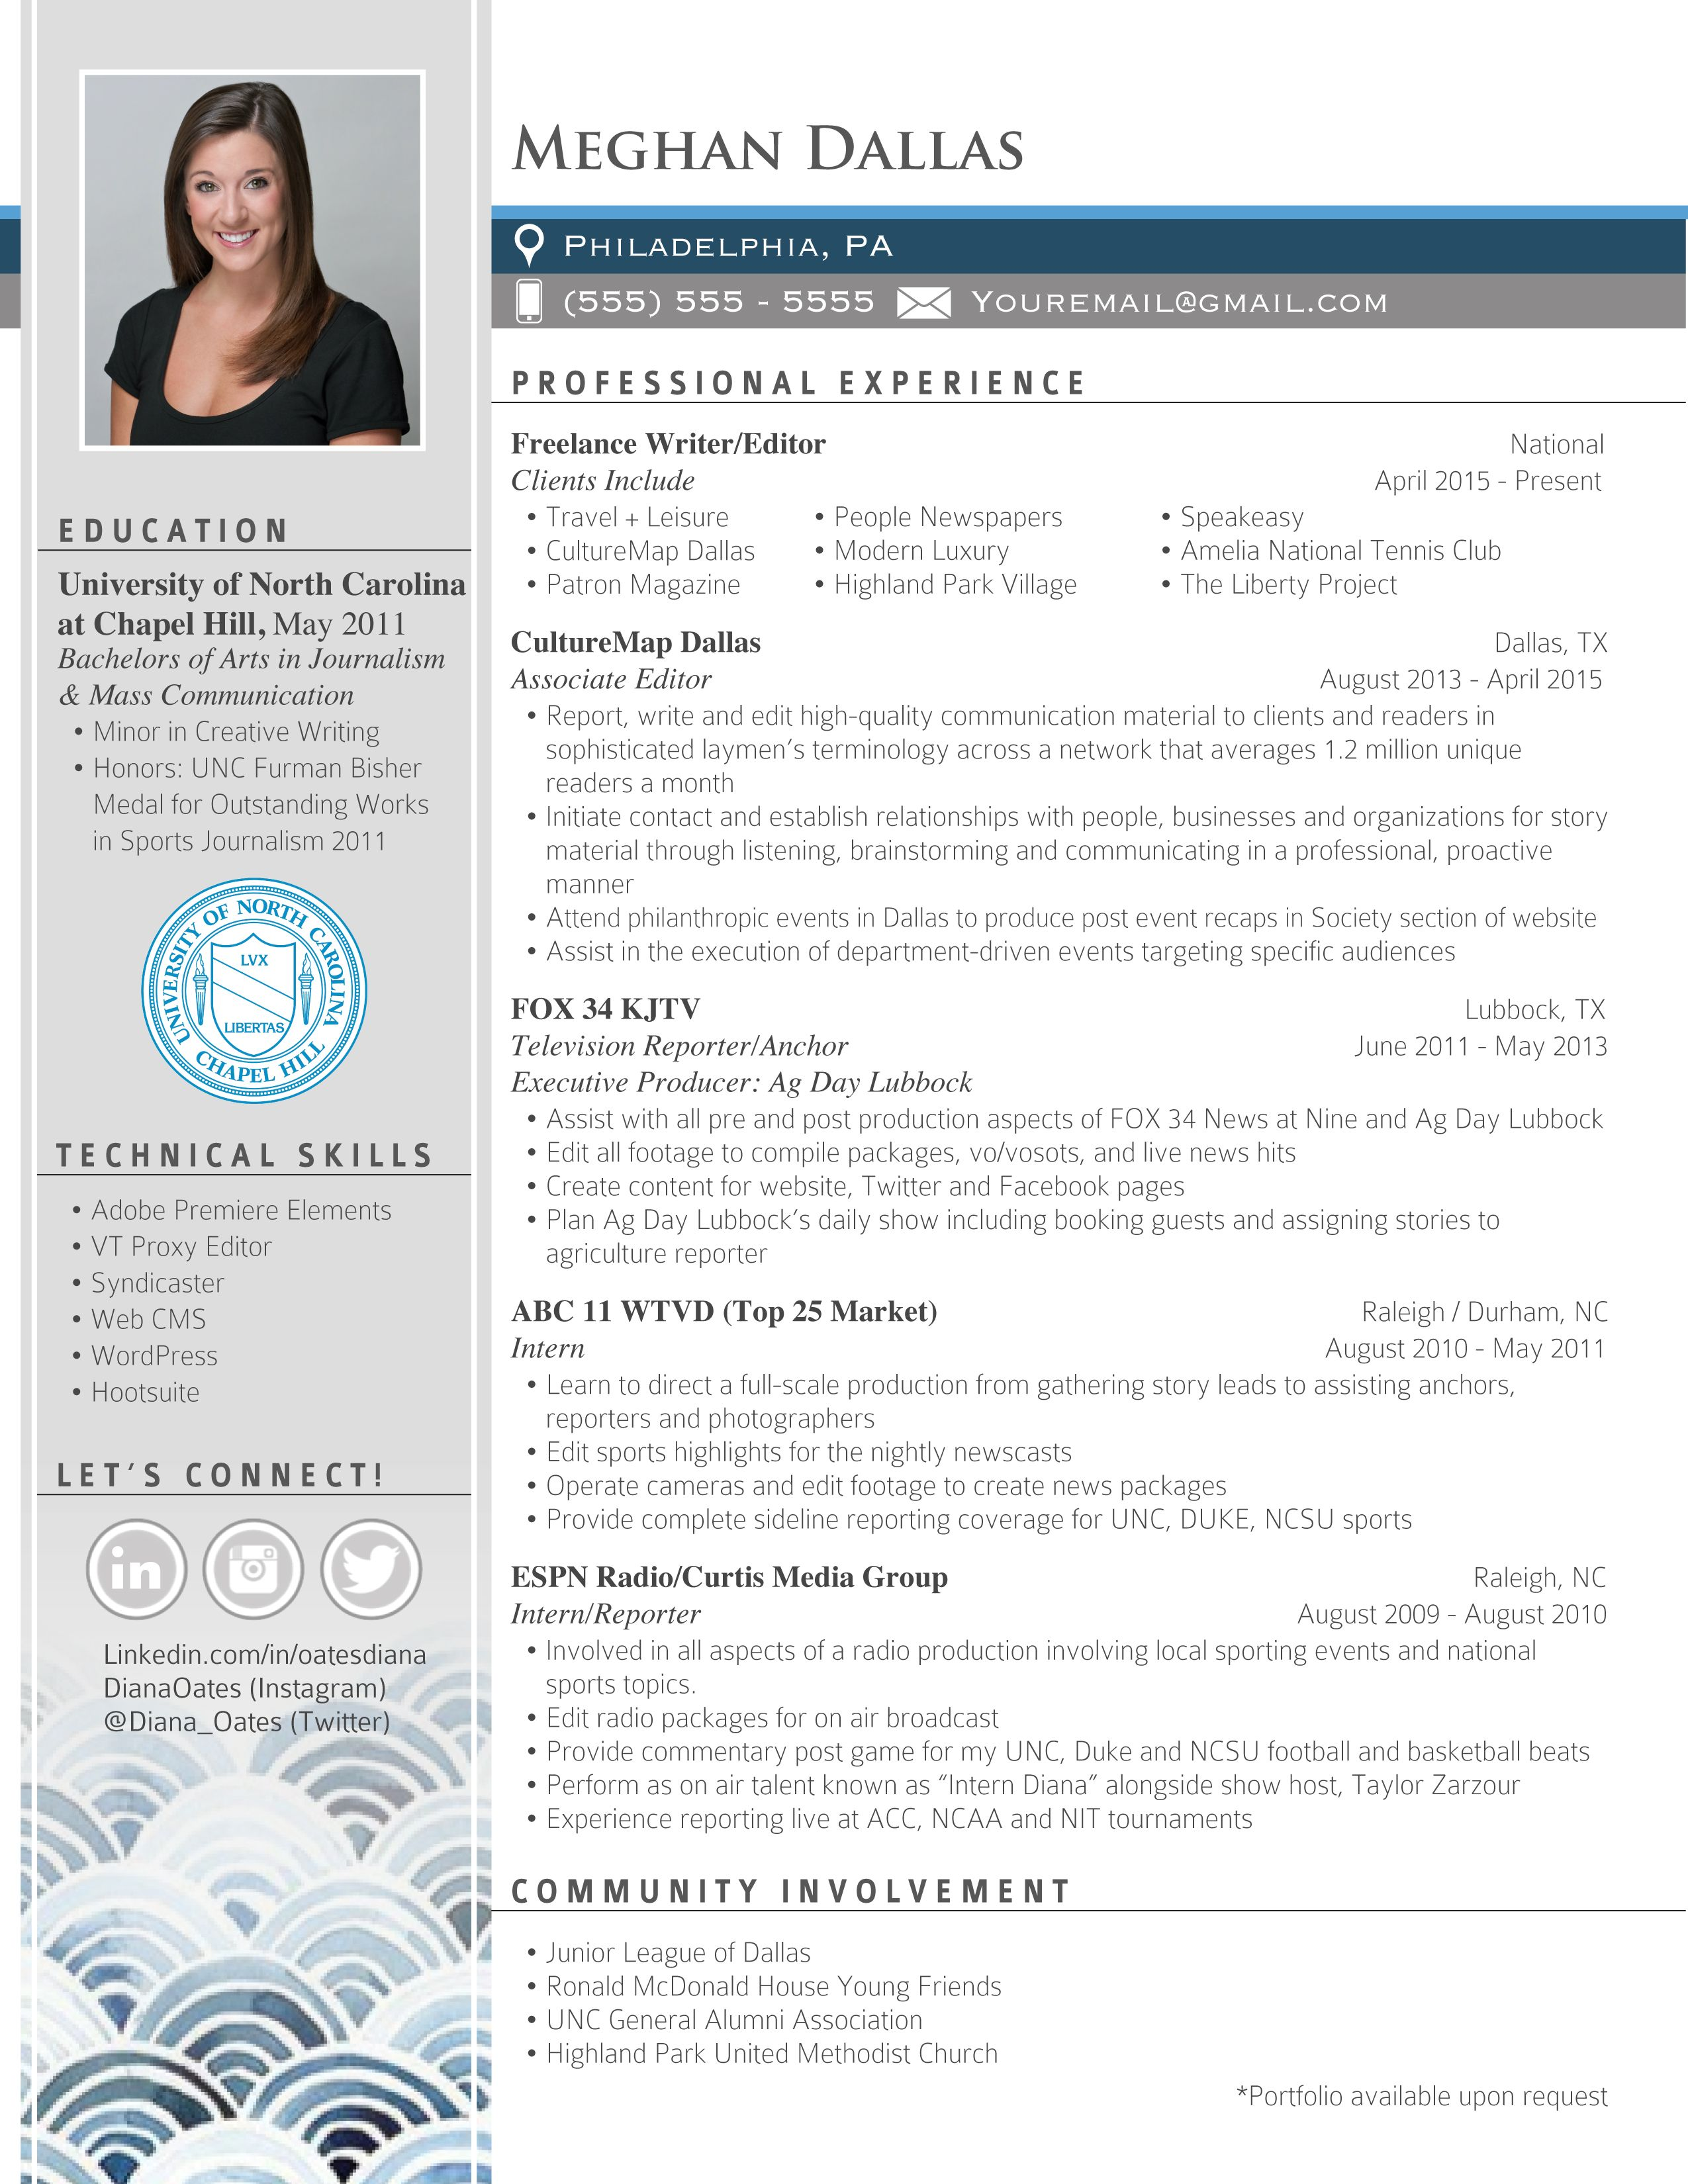 Creative Professional Resume Design By Elevatedresumes Com Dream